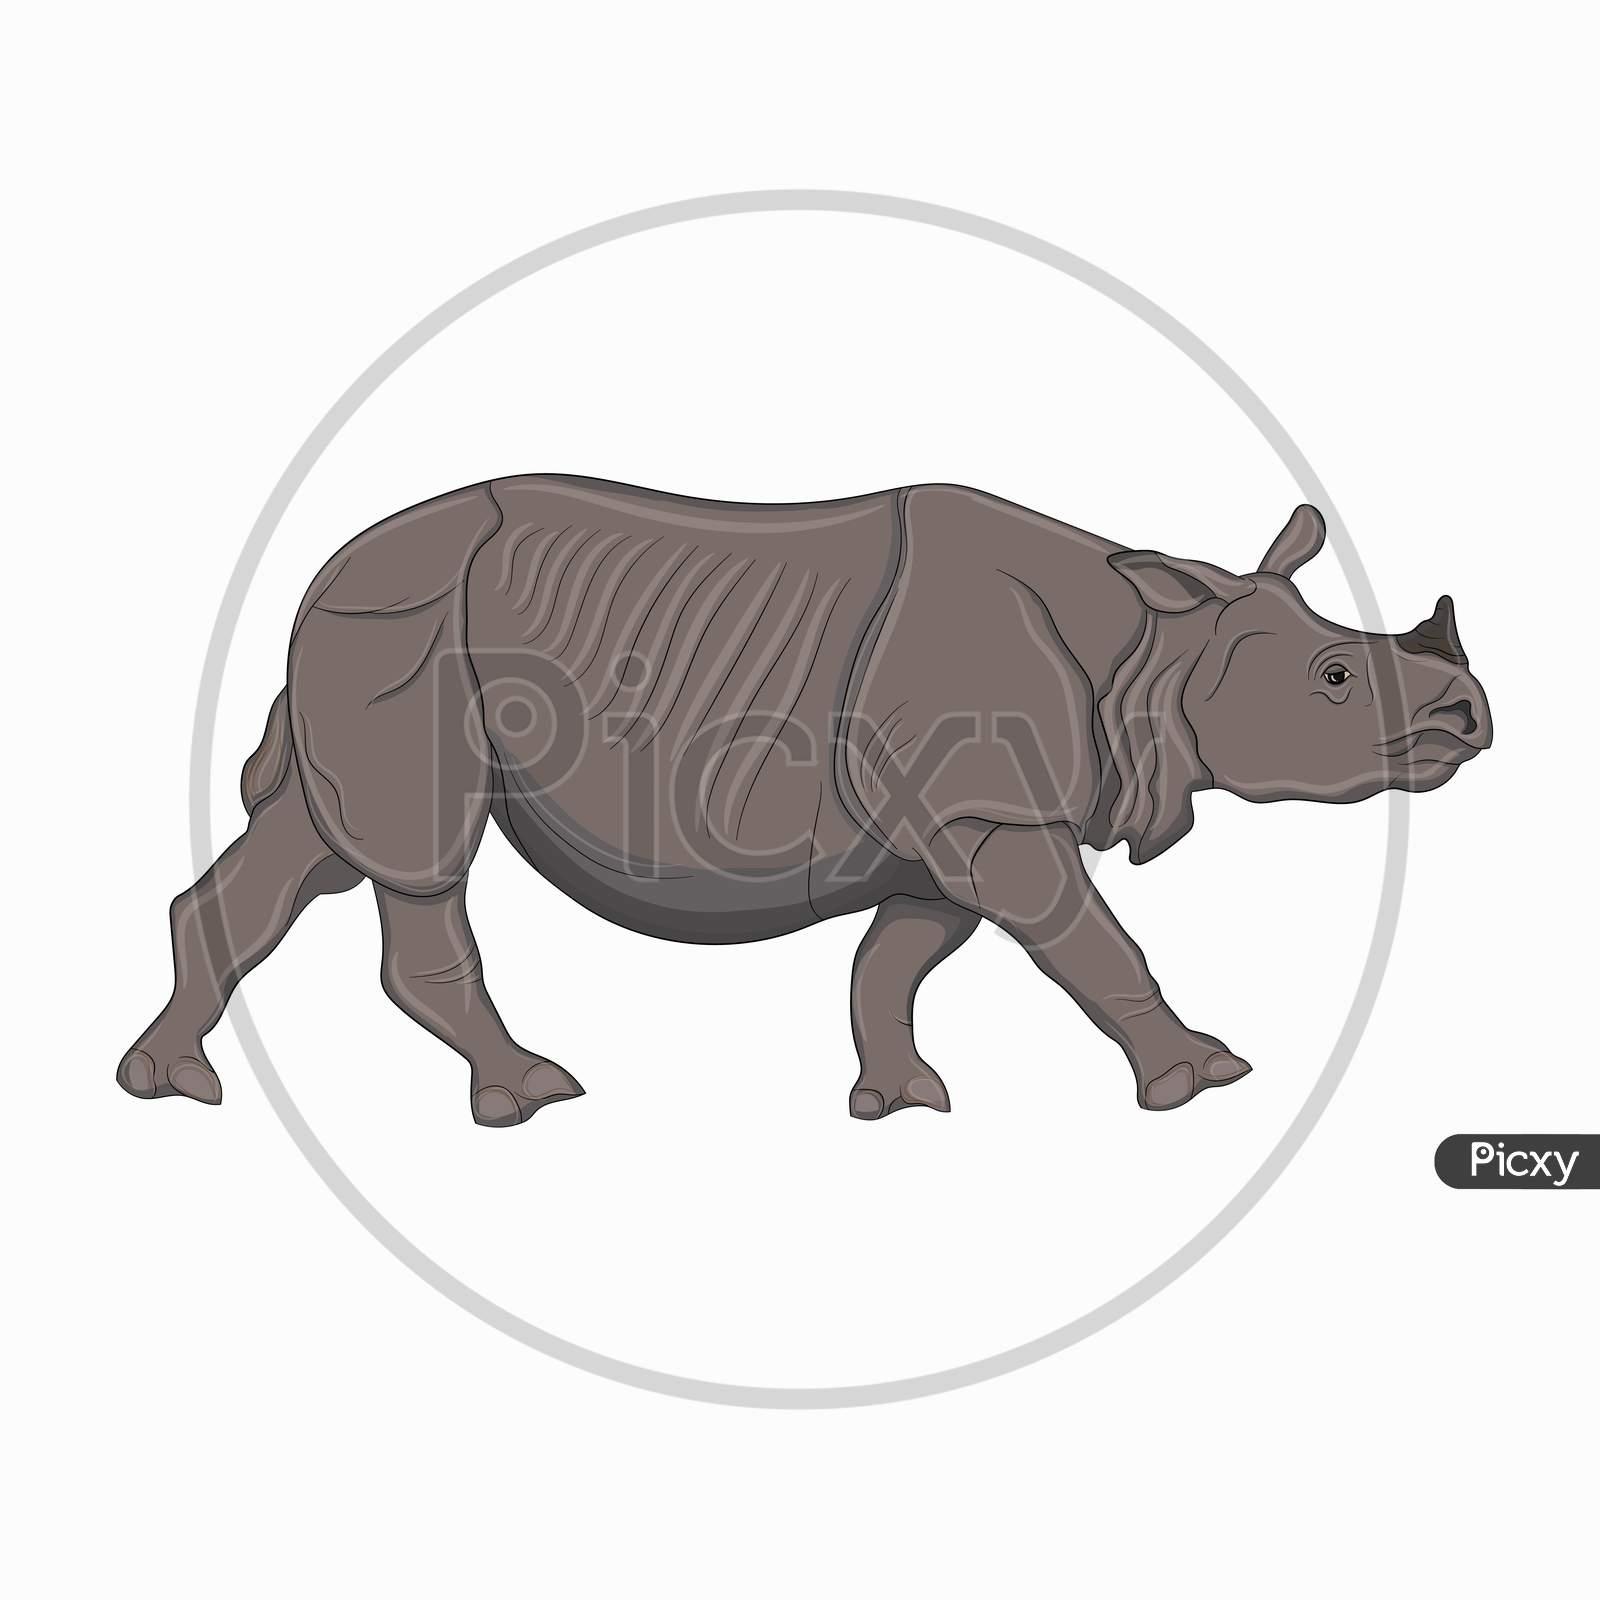 Detailed Illustration Of An Adult Rhinoceros, One-Horned Indian Rhinoceros